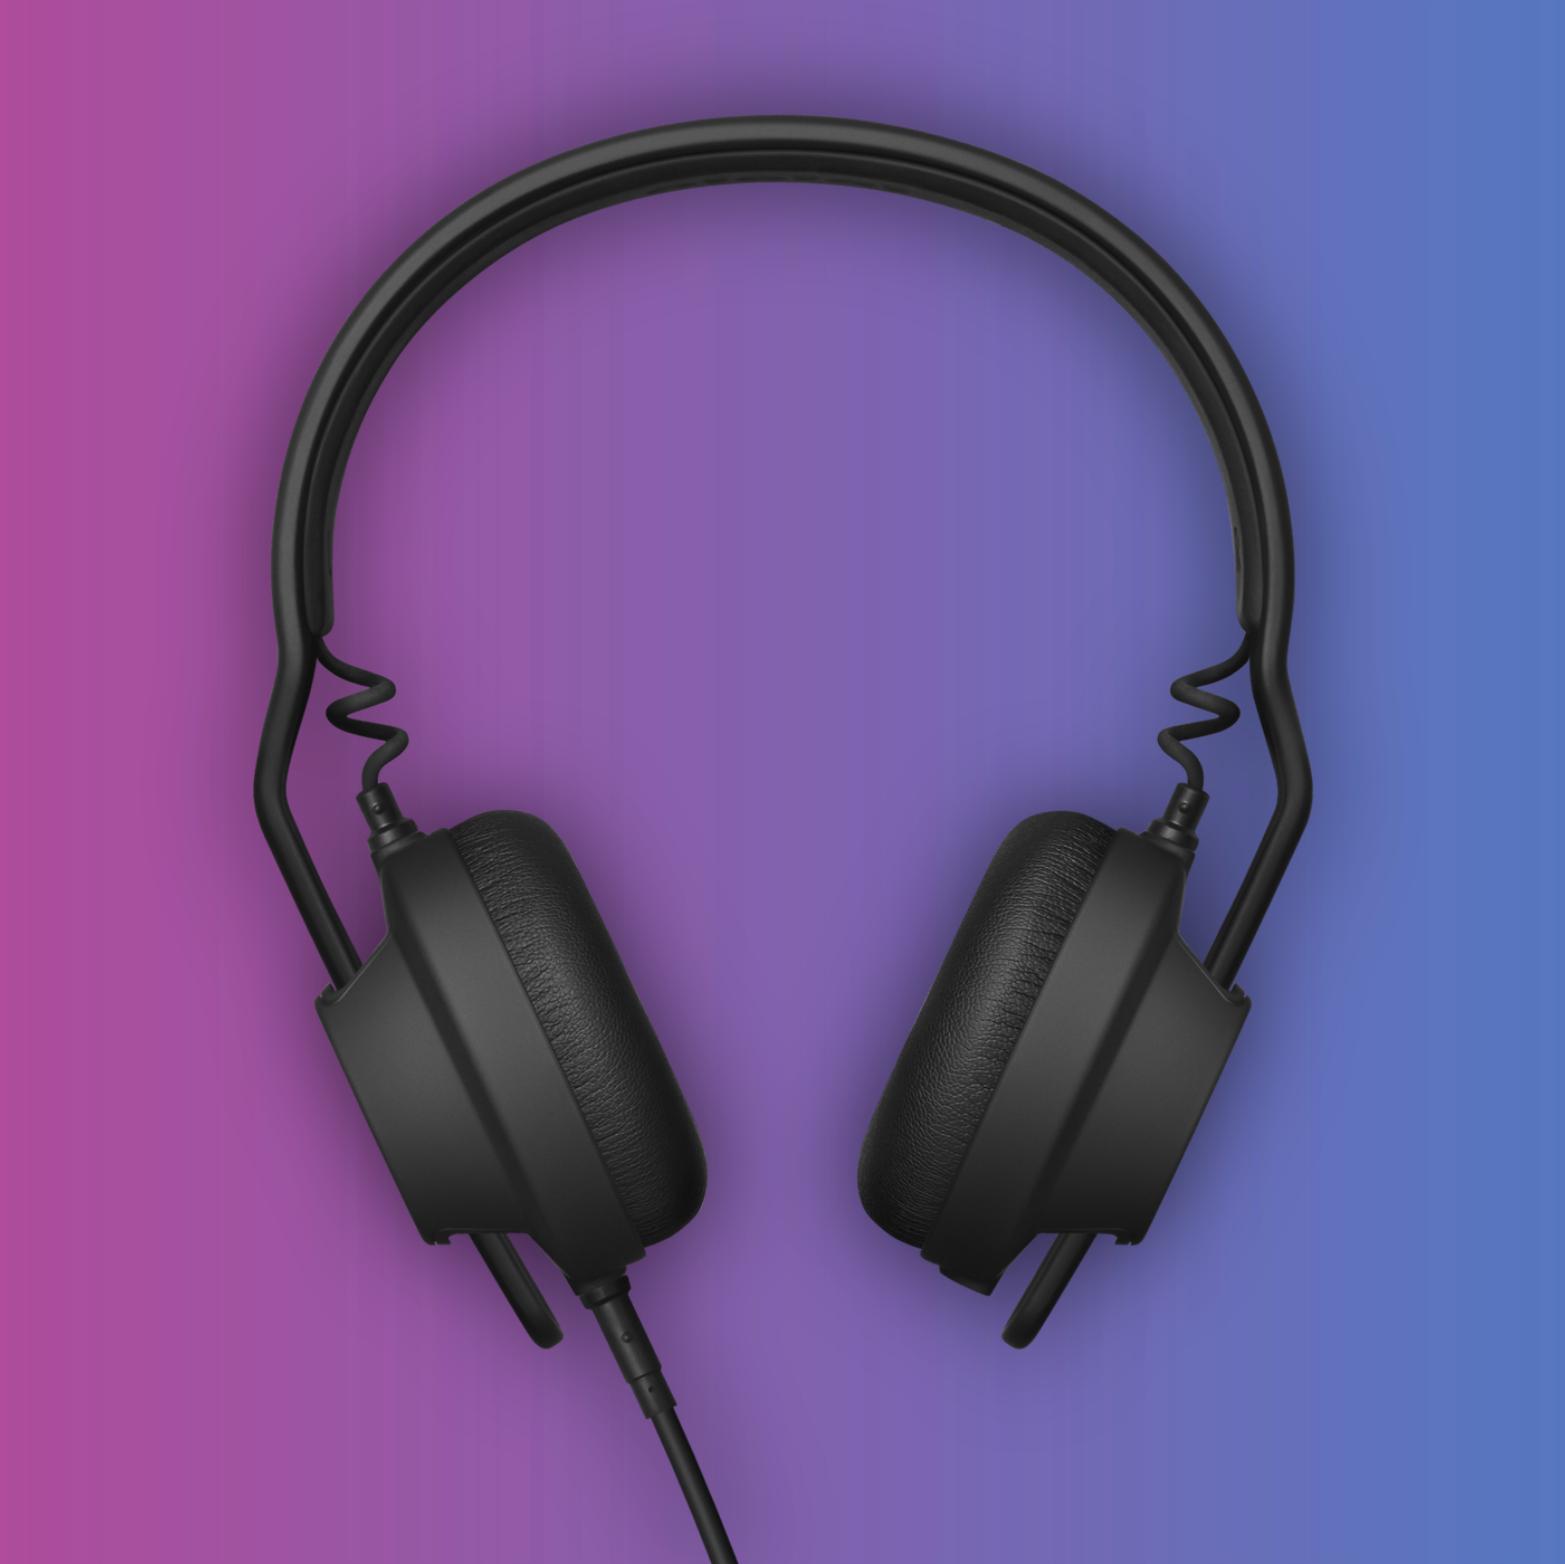 Aiaiai TMA-2: Modulare Over-Ear Kopfhörer (Monitor Preset, 40mm Treiber, 20Hz - 20kHz, 32 Ohm, 117dB)